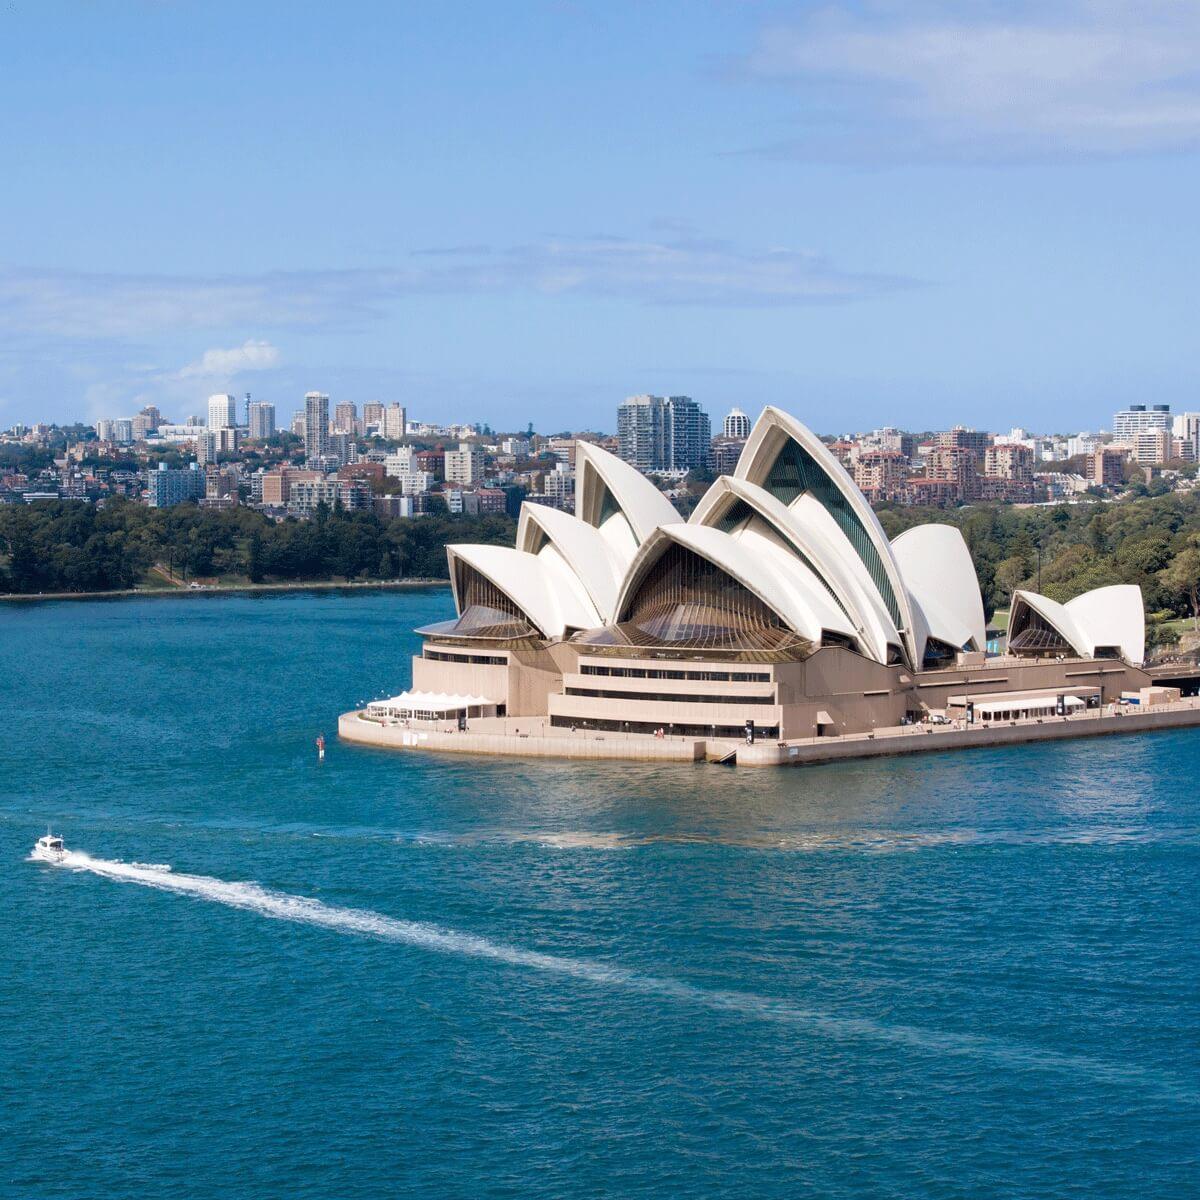 They Sydney Opera House